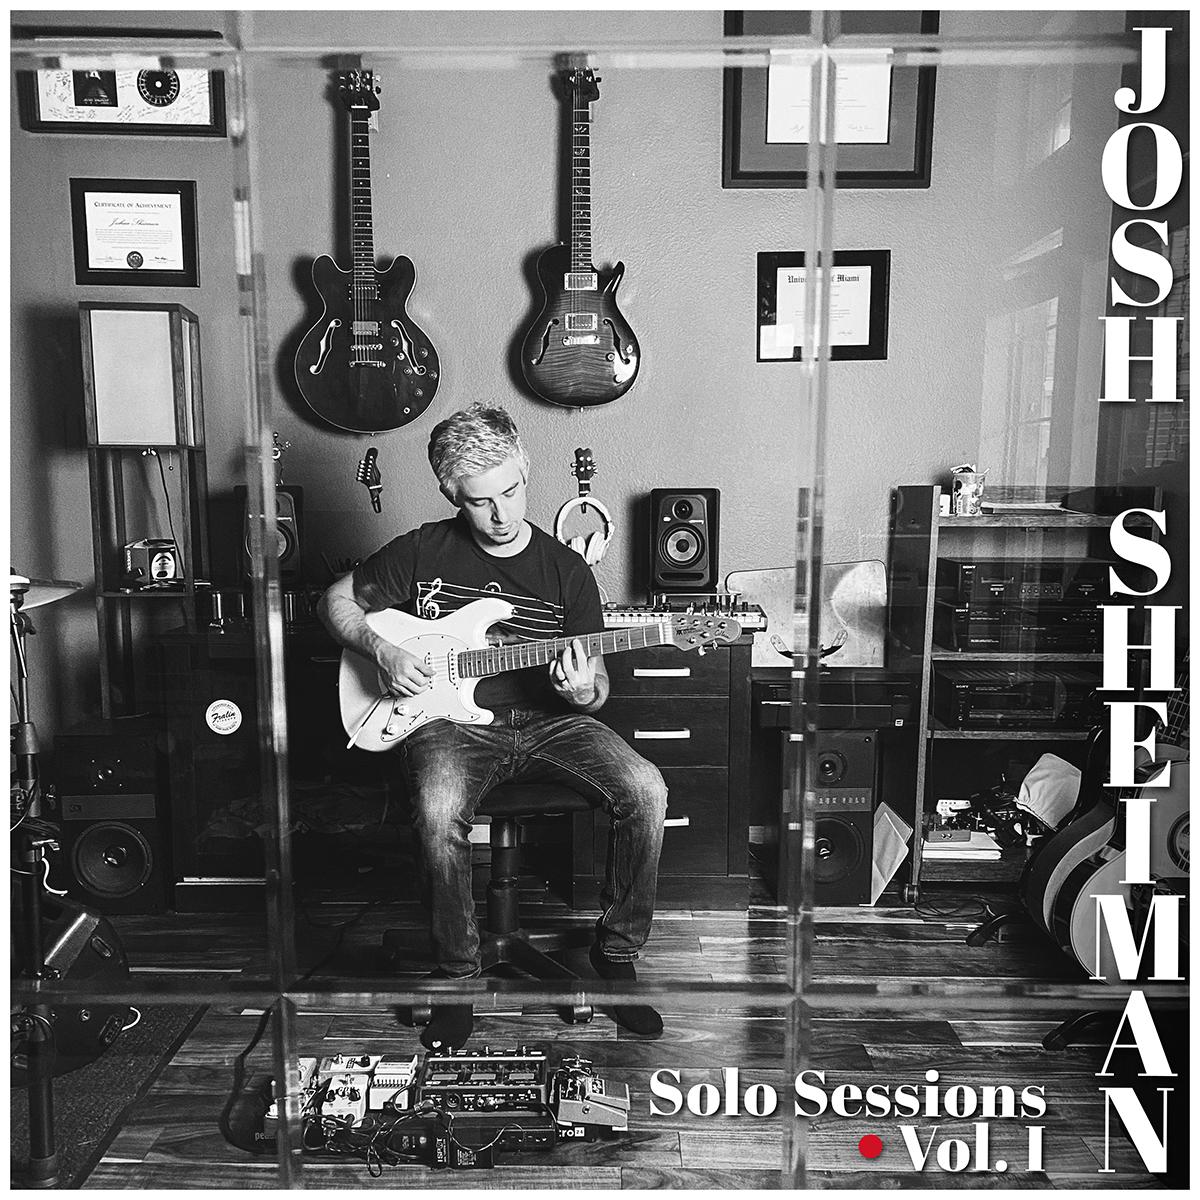 Solo Sessions Vol. I